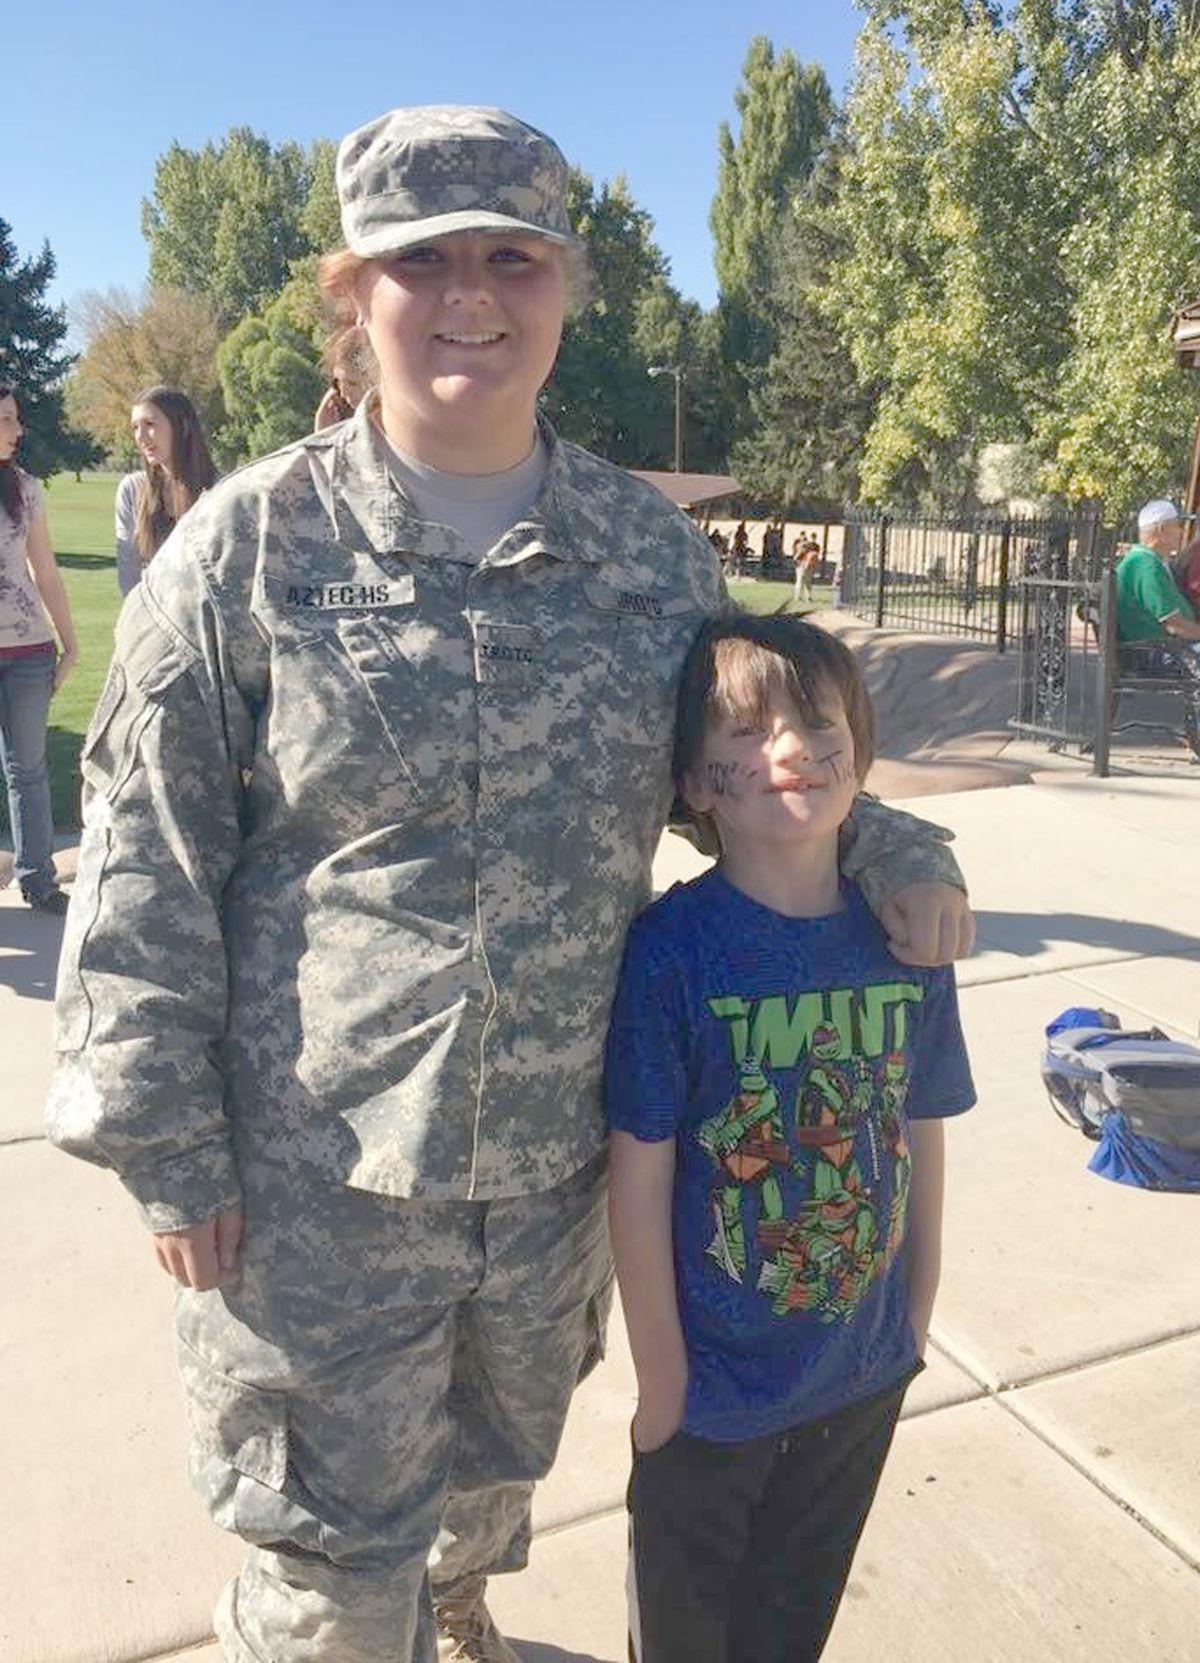 School shooting survivor in uniform with little brother